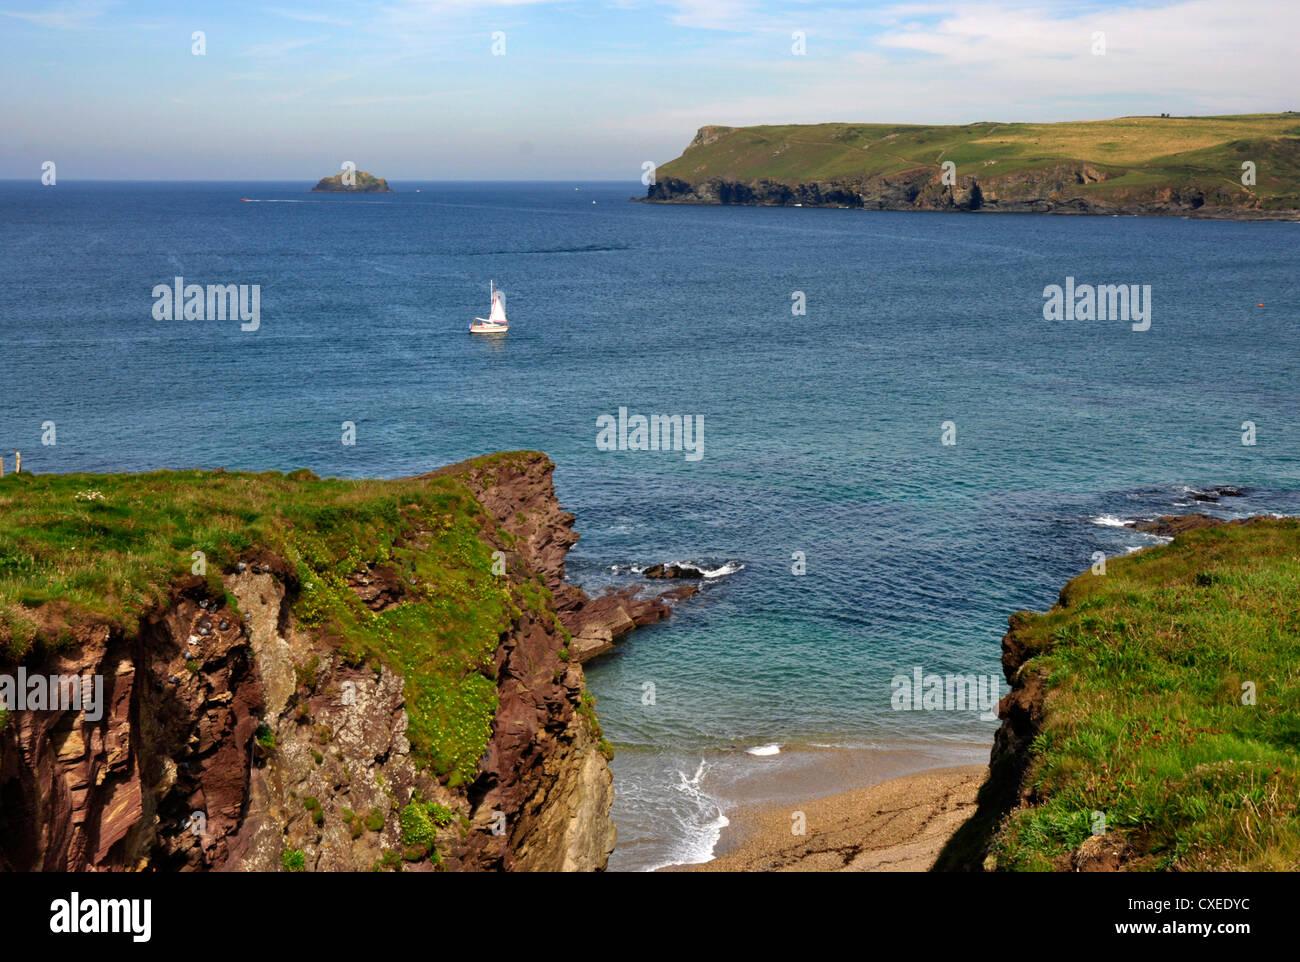 North Cornwall Coast path - near Polzeath - white sail  on azure blue sea - crossing Hayle Bay - backdrop Pentire - Stock Image